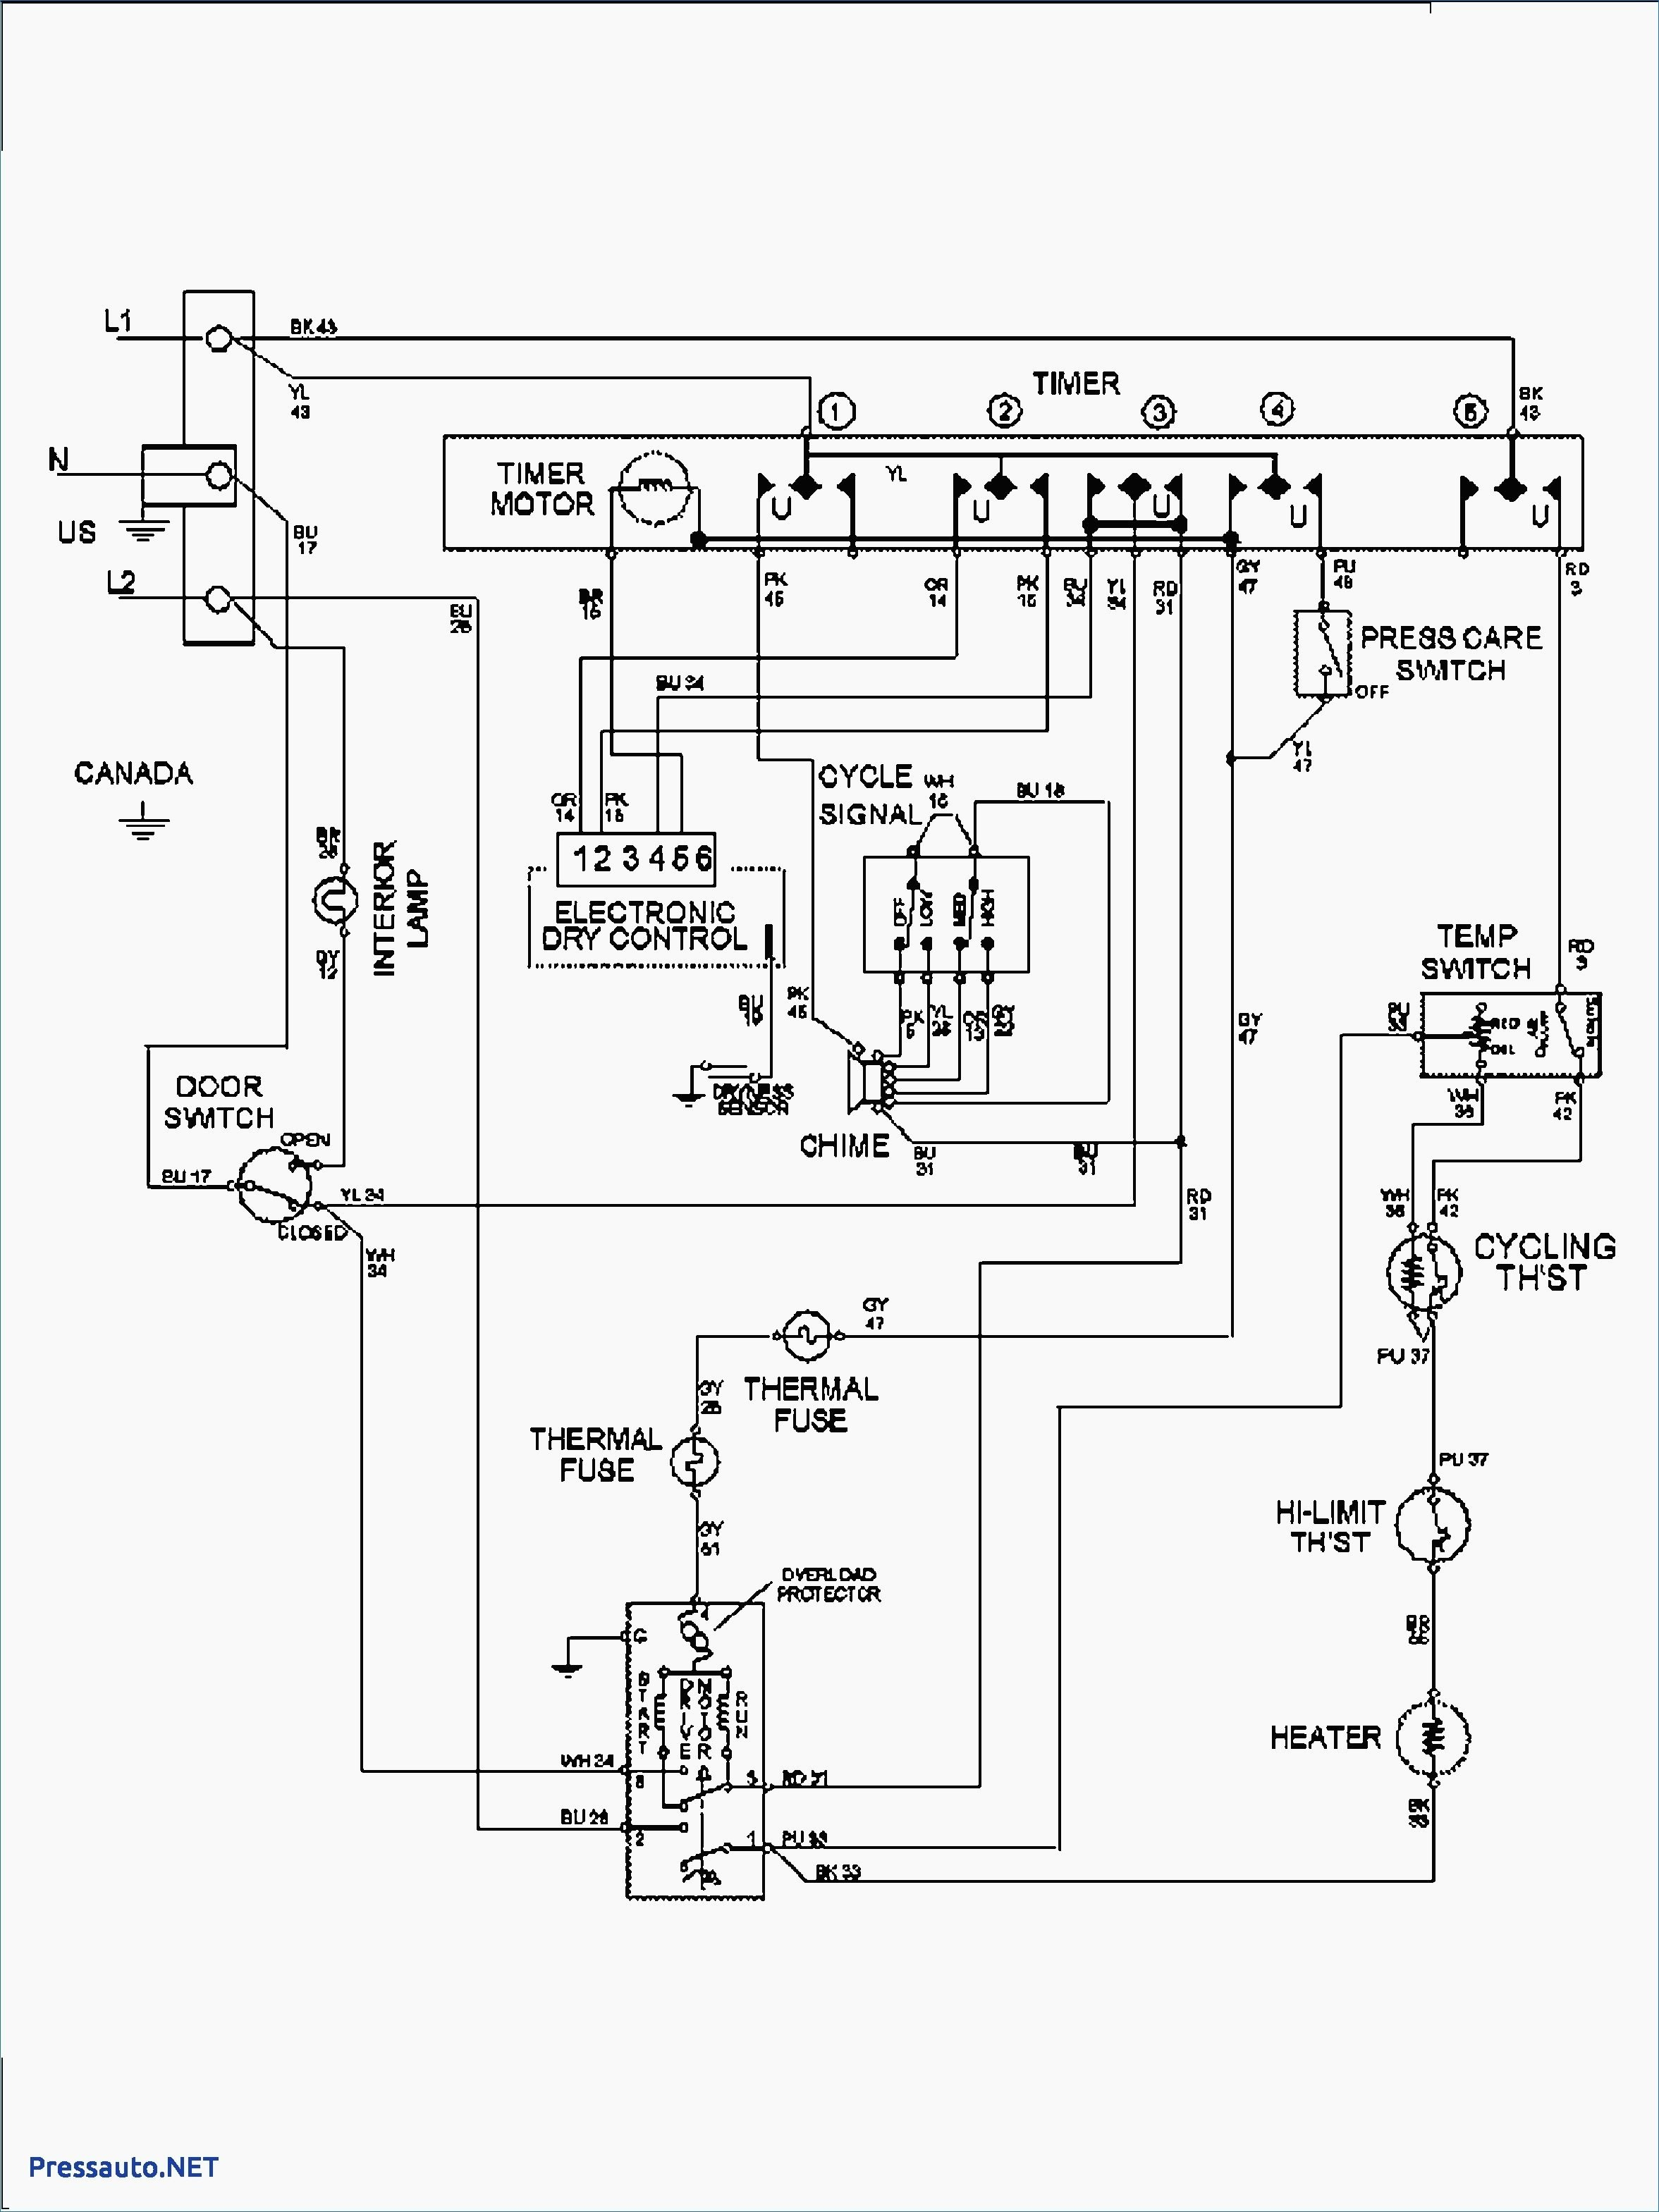 Whirlpool Dryer Wiring Diagram Whirlpool Ler4634eq2 Best Amana Dryer Wiring Diagram Fresh for Of Whirlpool Dryer Wiring Diagram